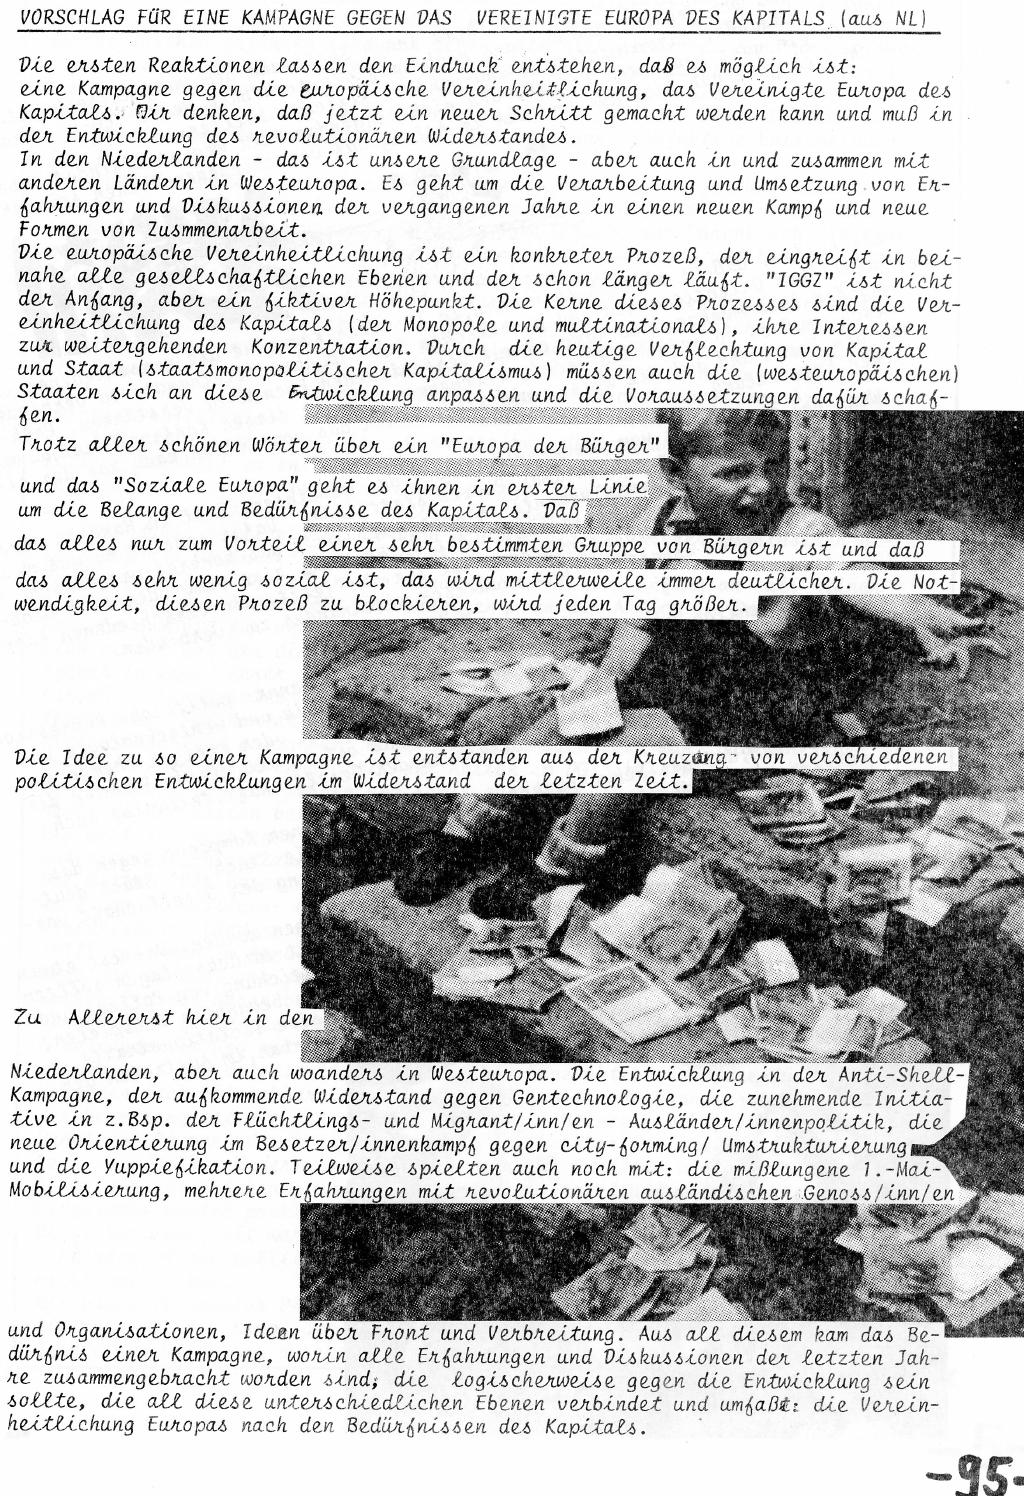 Belgien_Doku_Besetzung_EG_Kommission_1989_097